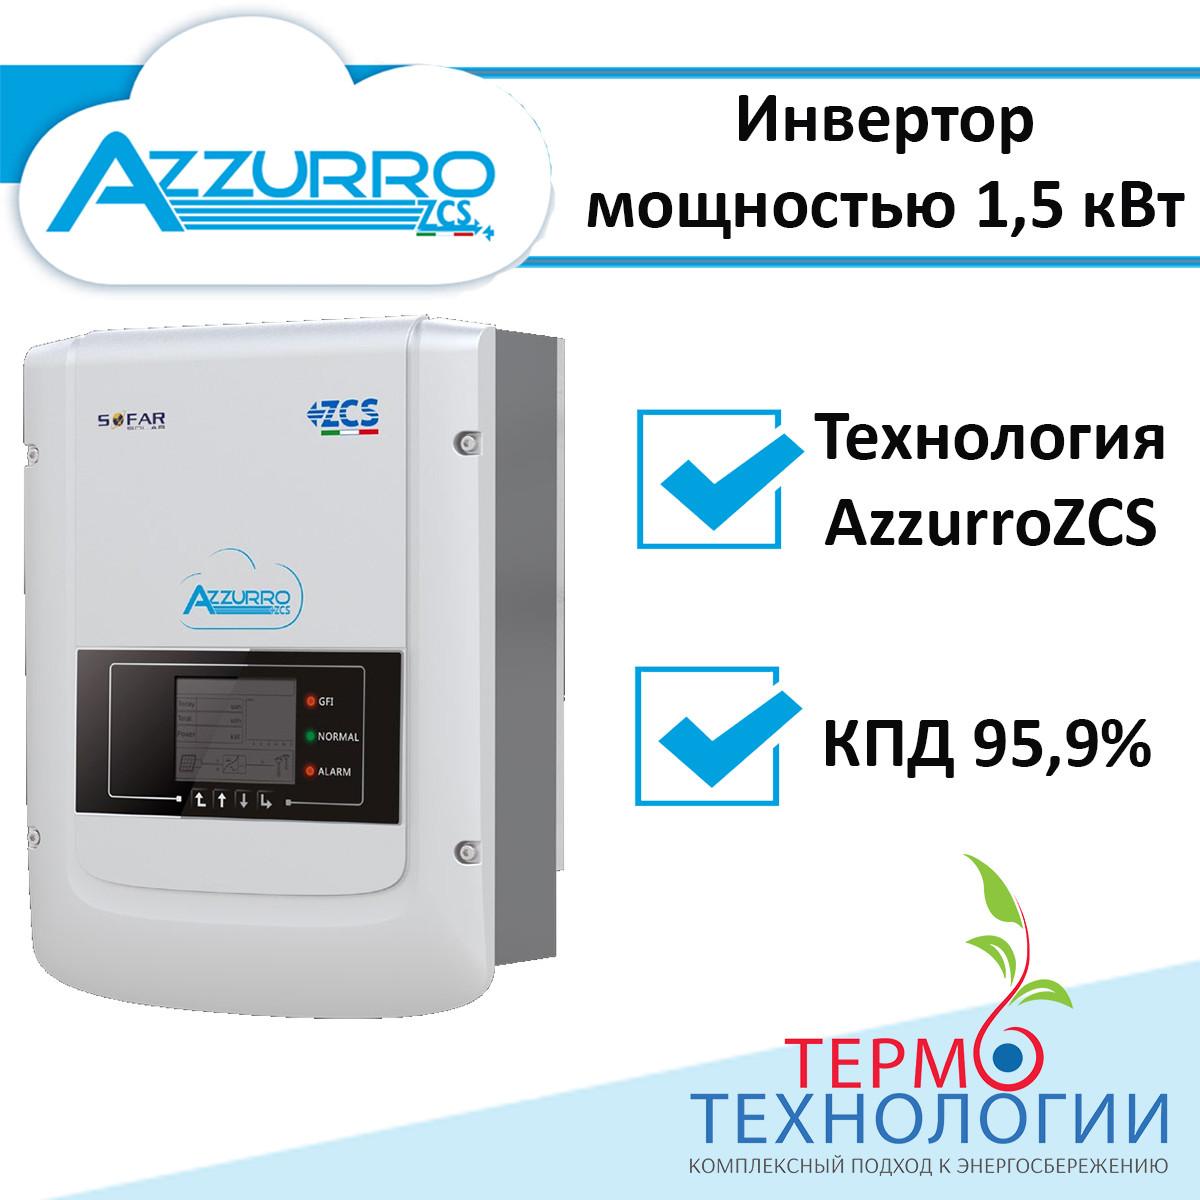 Солнечный инвертор сетевой AZZURRO 1,5 кВт, 1Ф